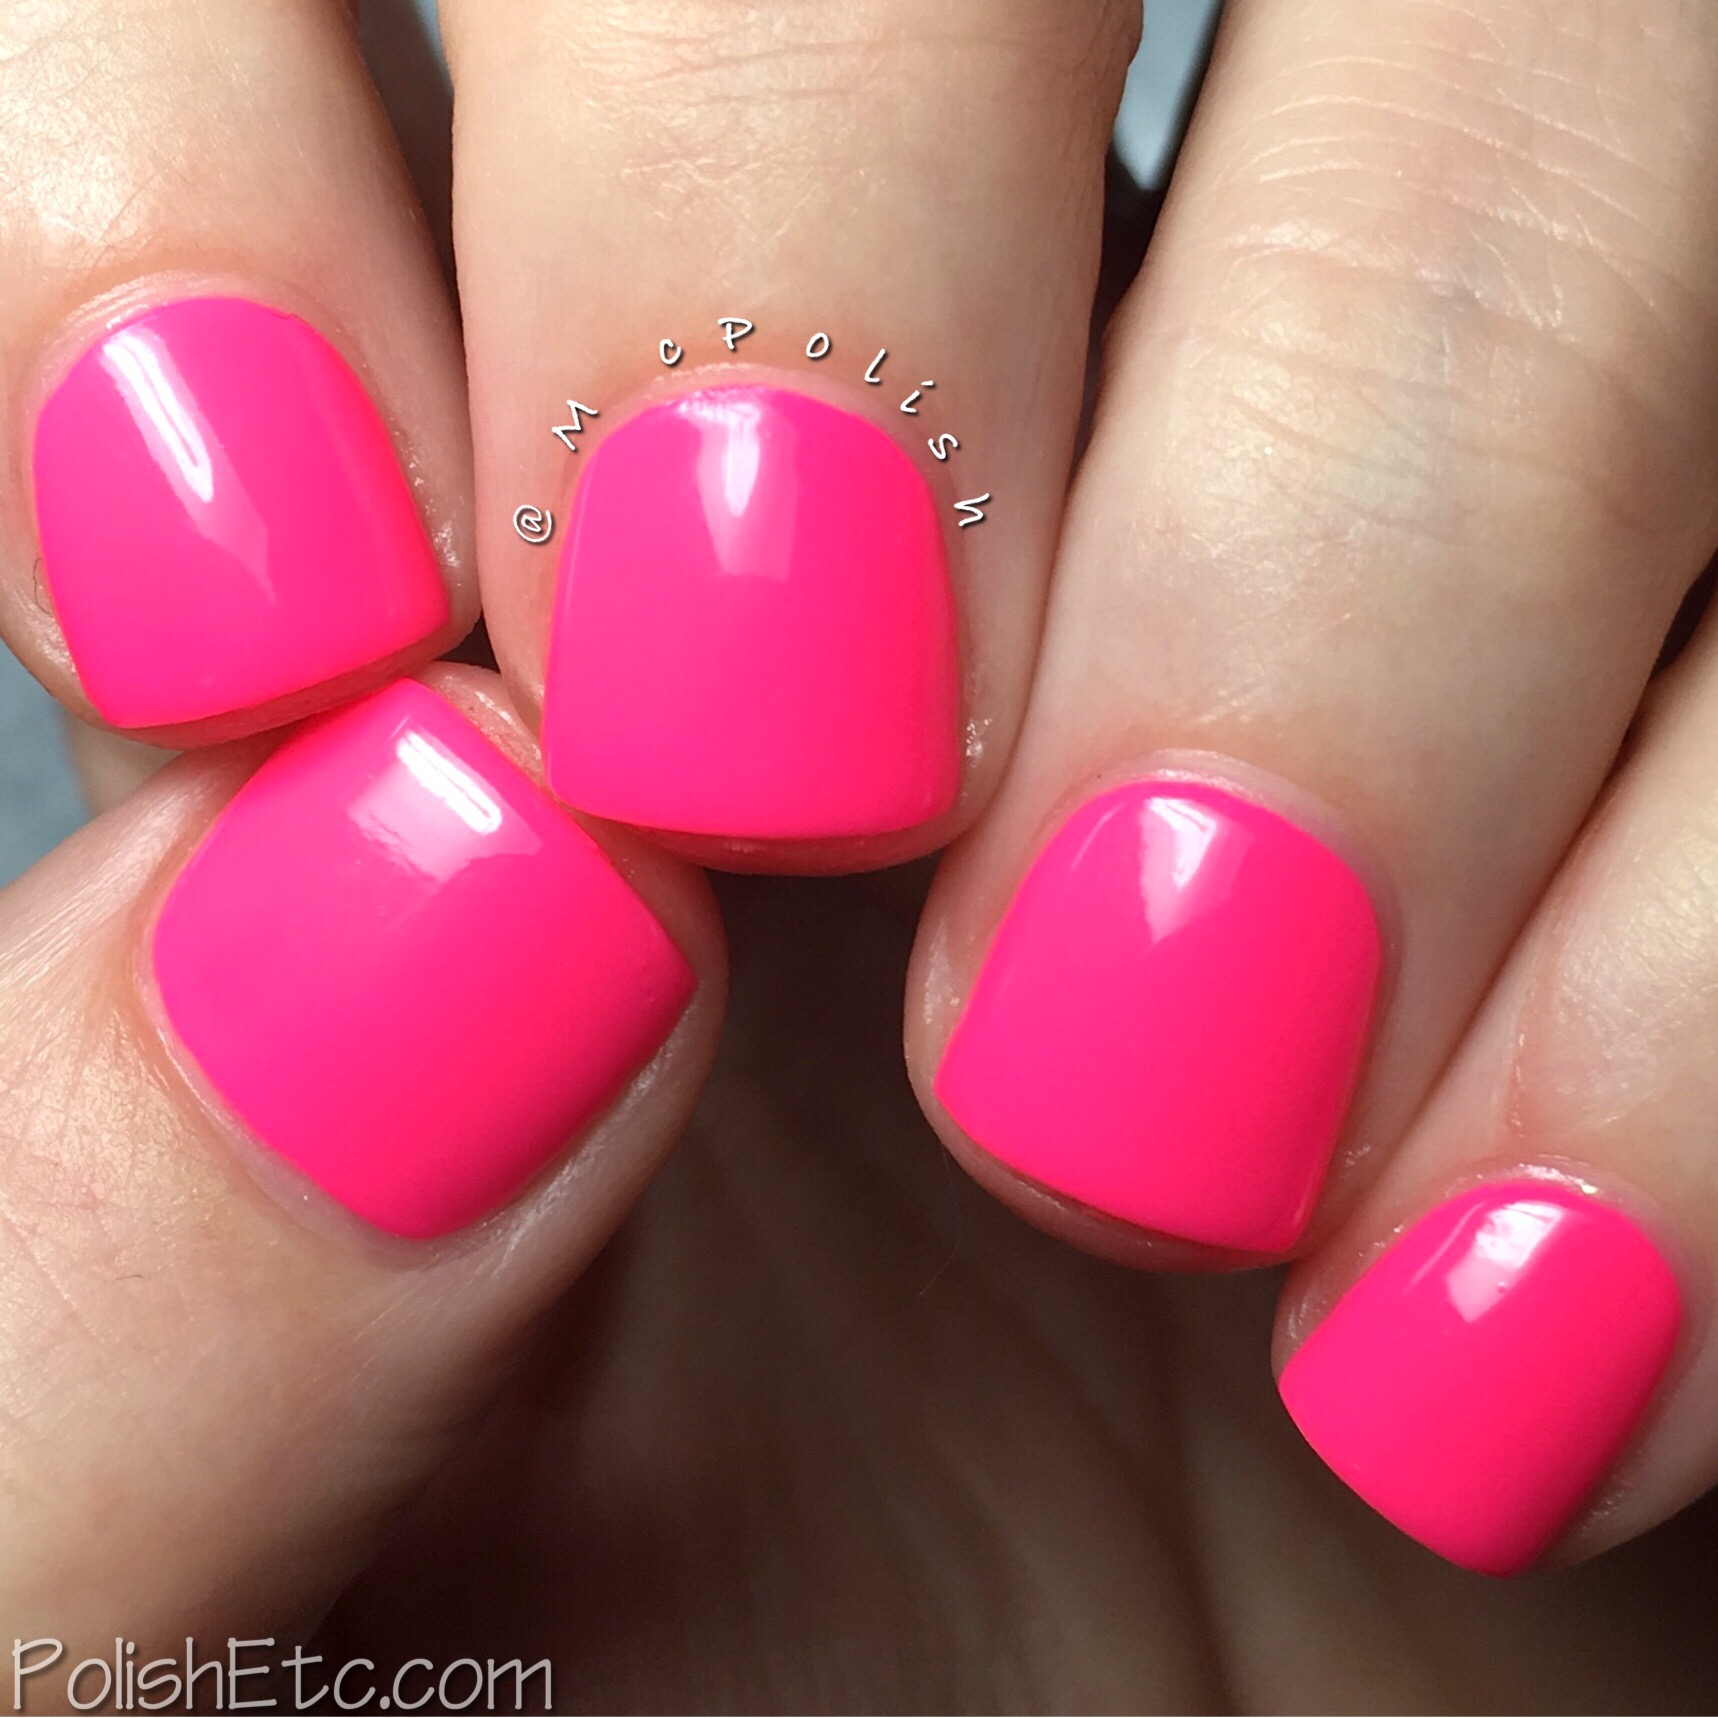 How Low Can You Flamingo Nail Polish